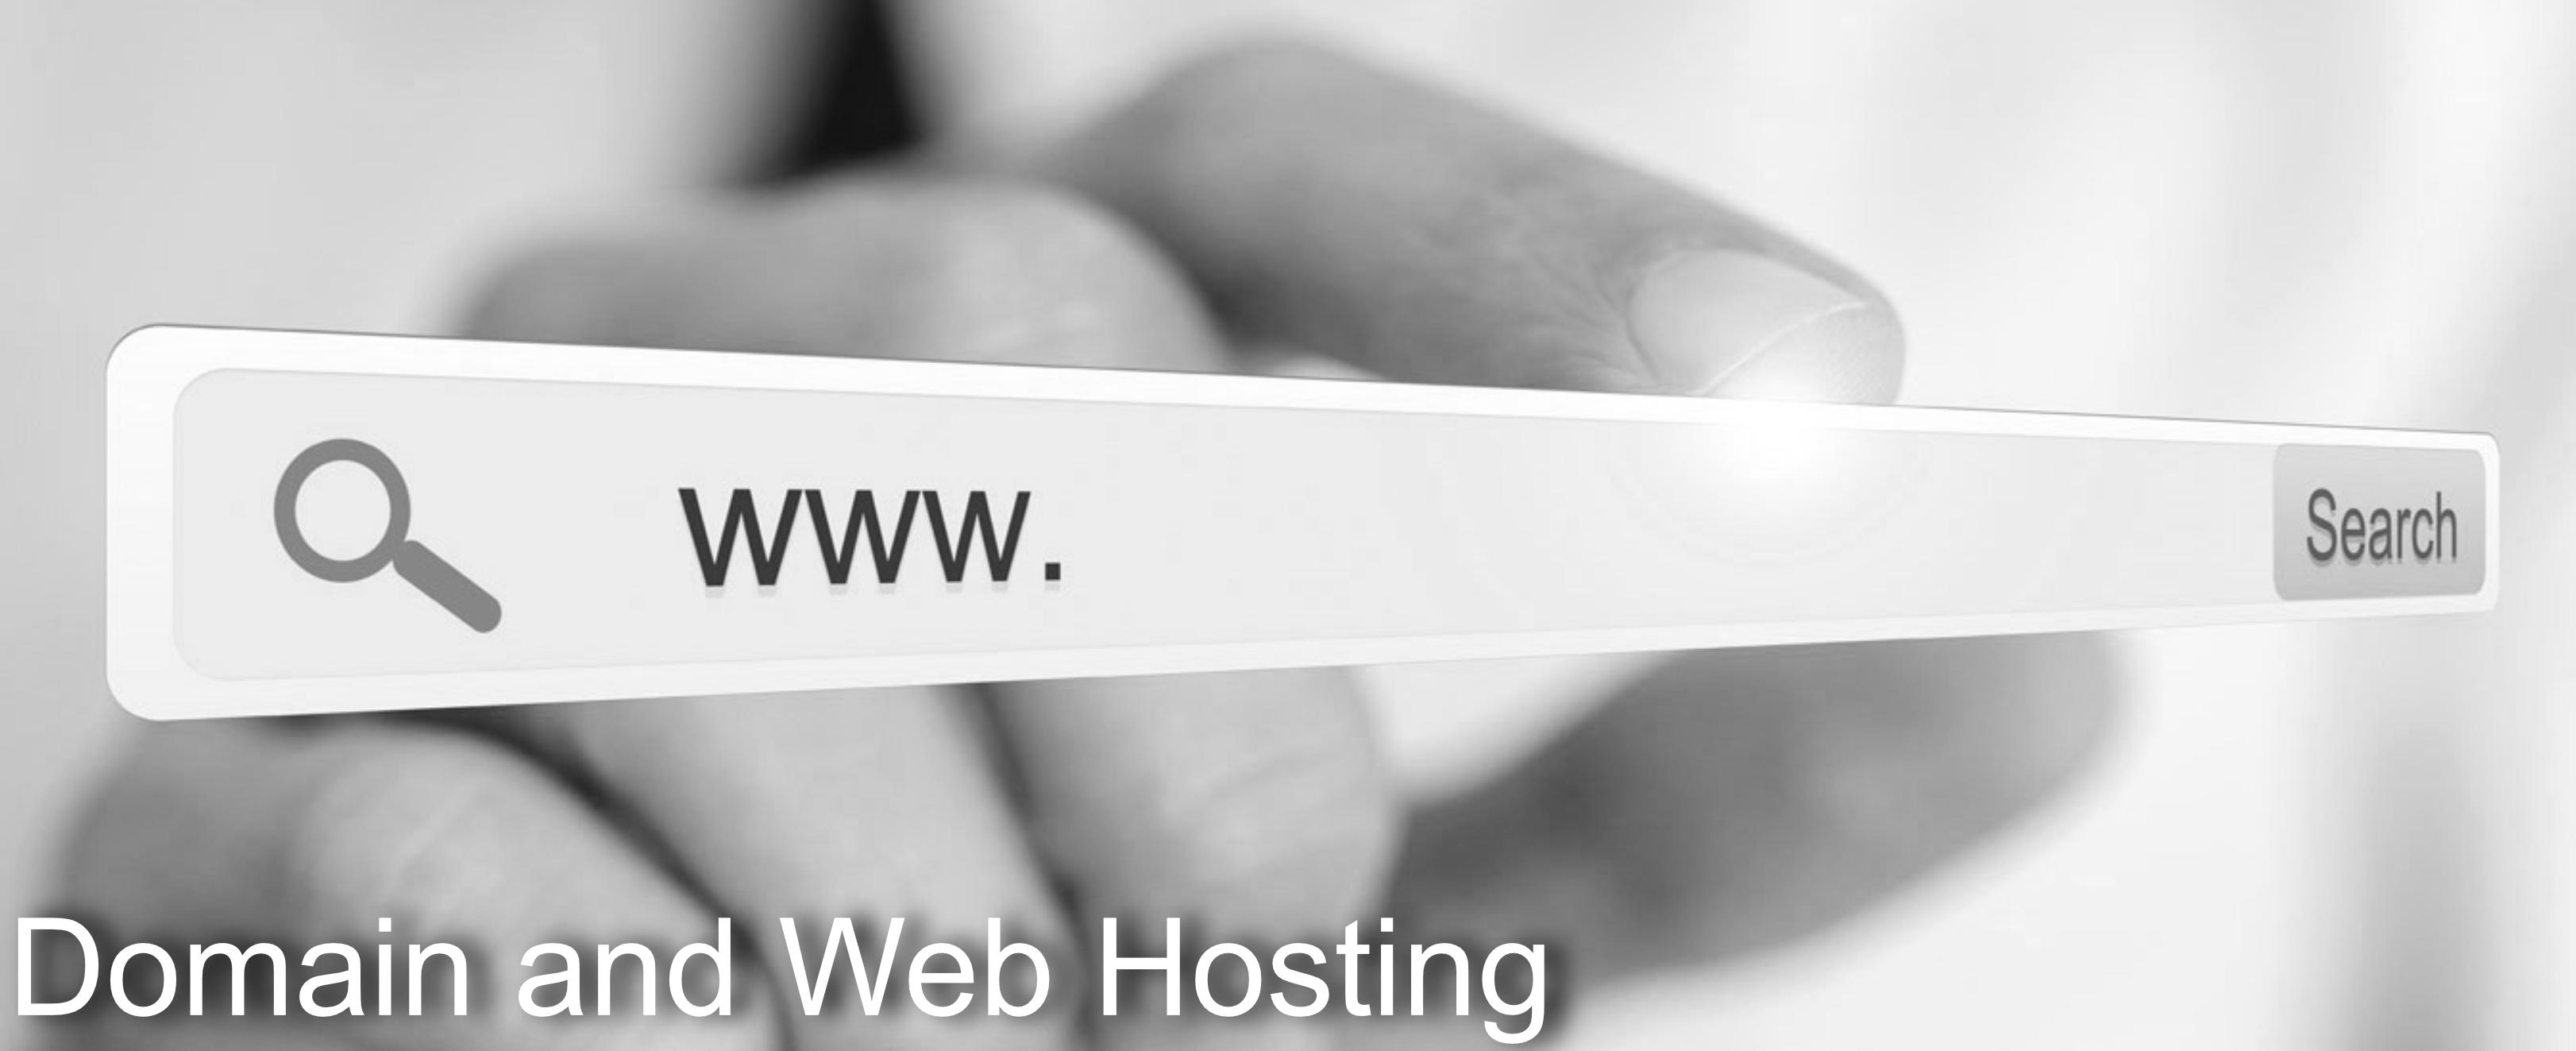 Domain and Web